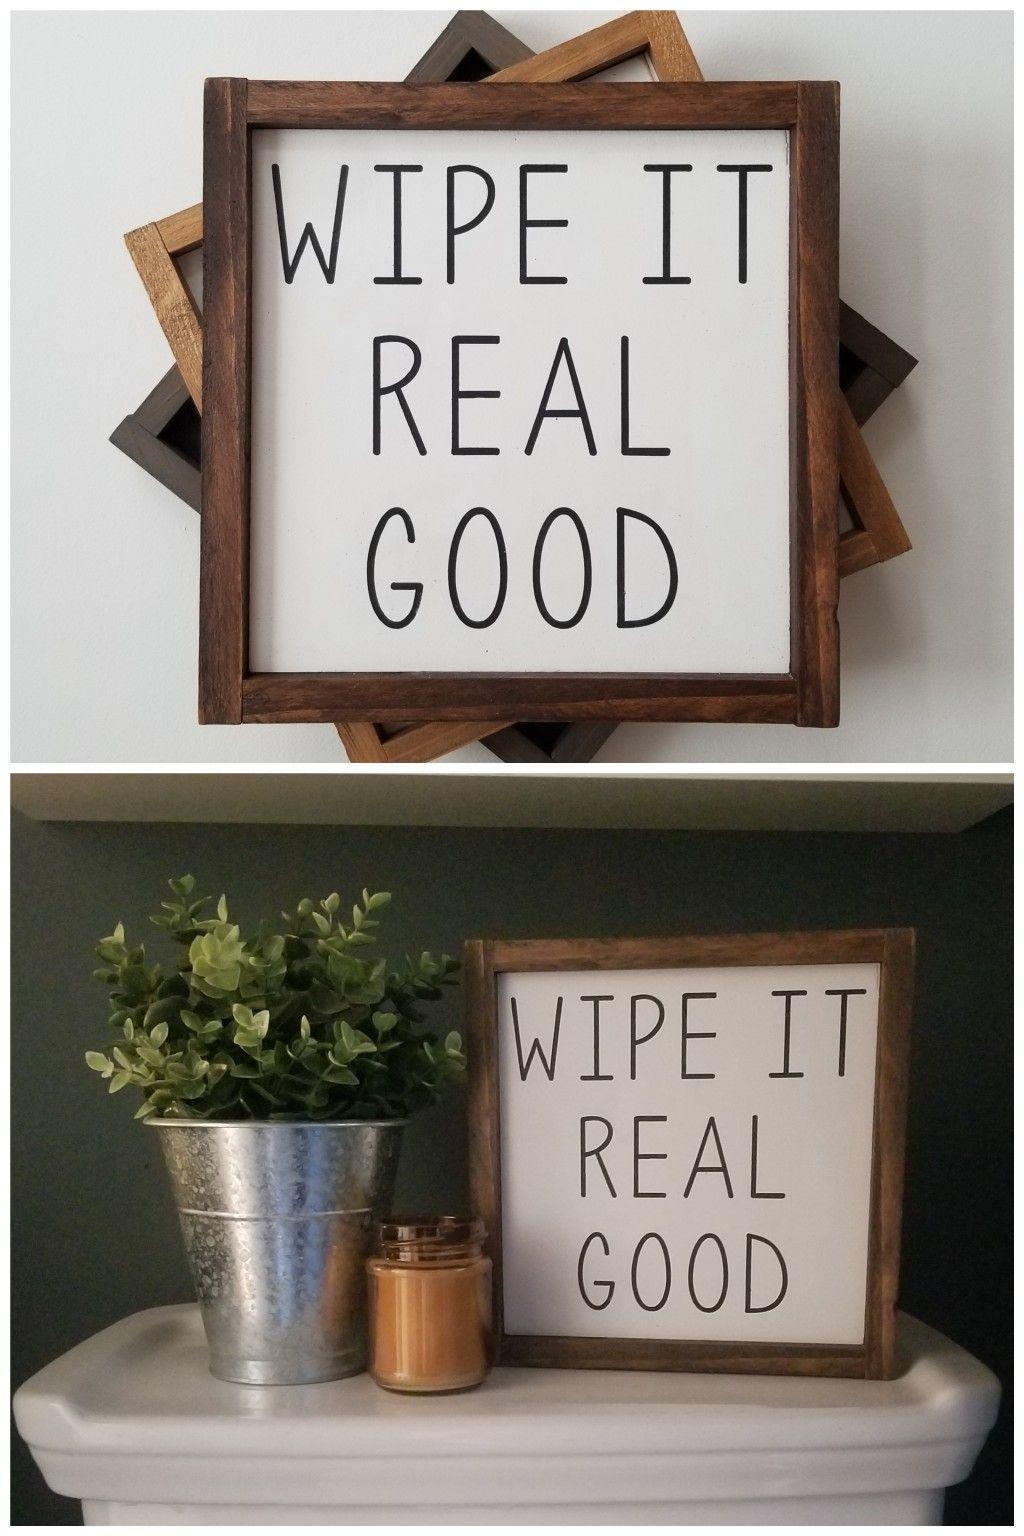 Wipe It Real Good Sign Bathroom Wall Decor Rustic Home Etsy Rustic Bathroom Wall Decor Powder Room Decor Bathroom Signs